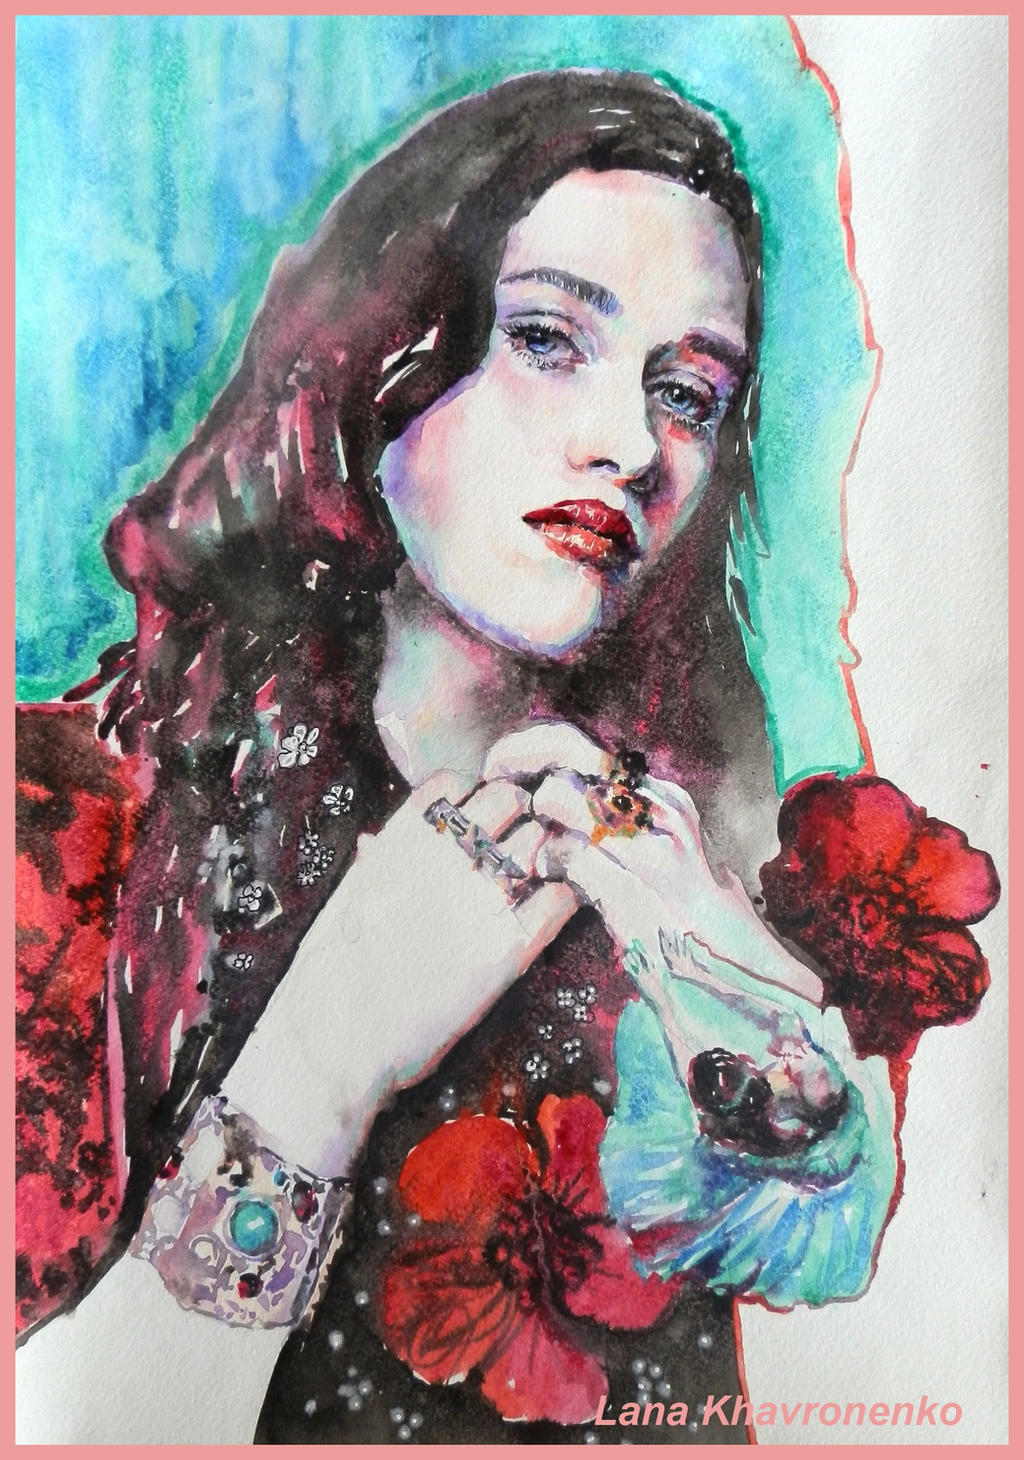 Waltz of the Flowers by LORETANA on DeviantArt